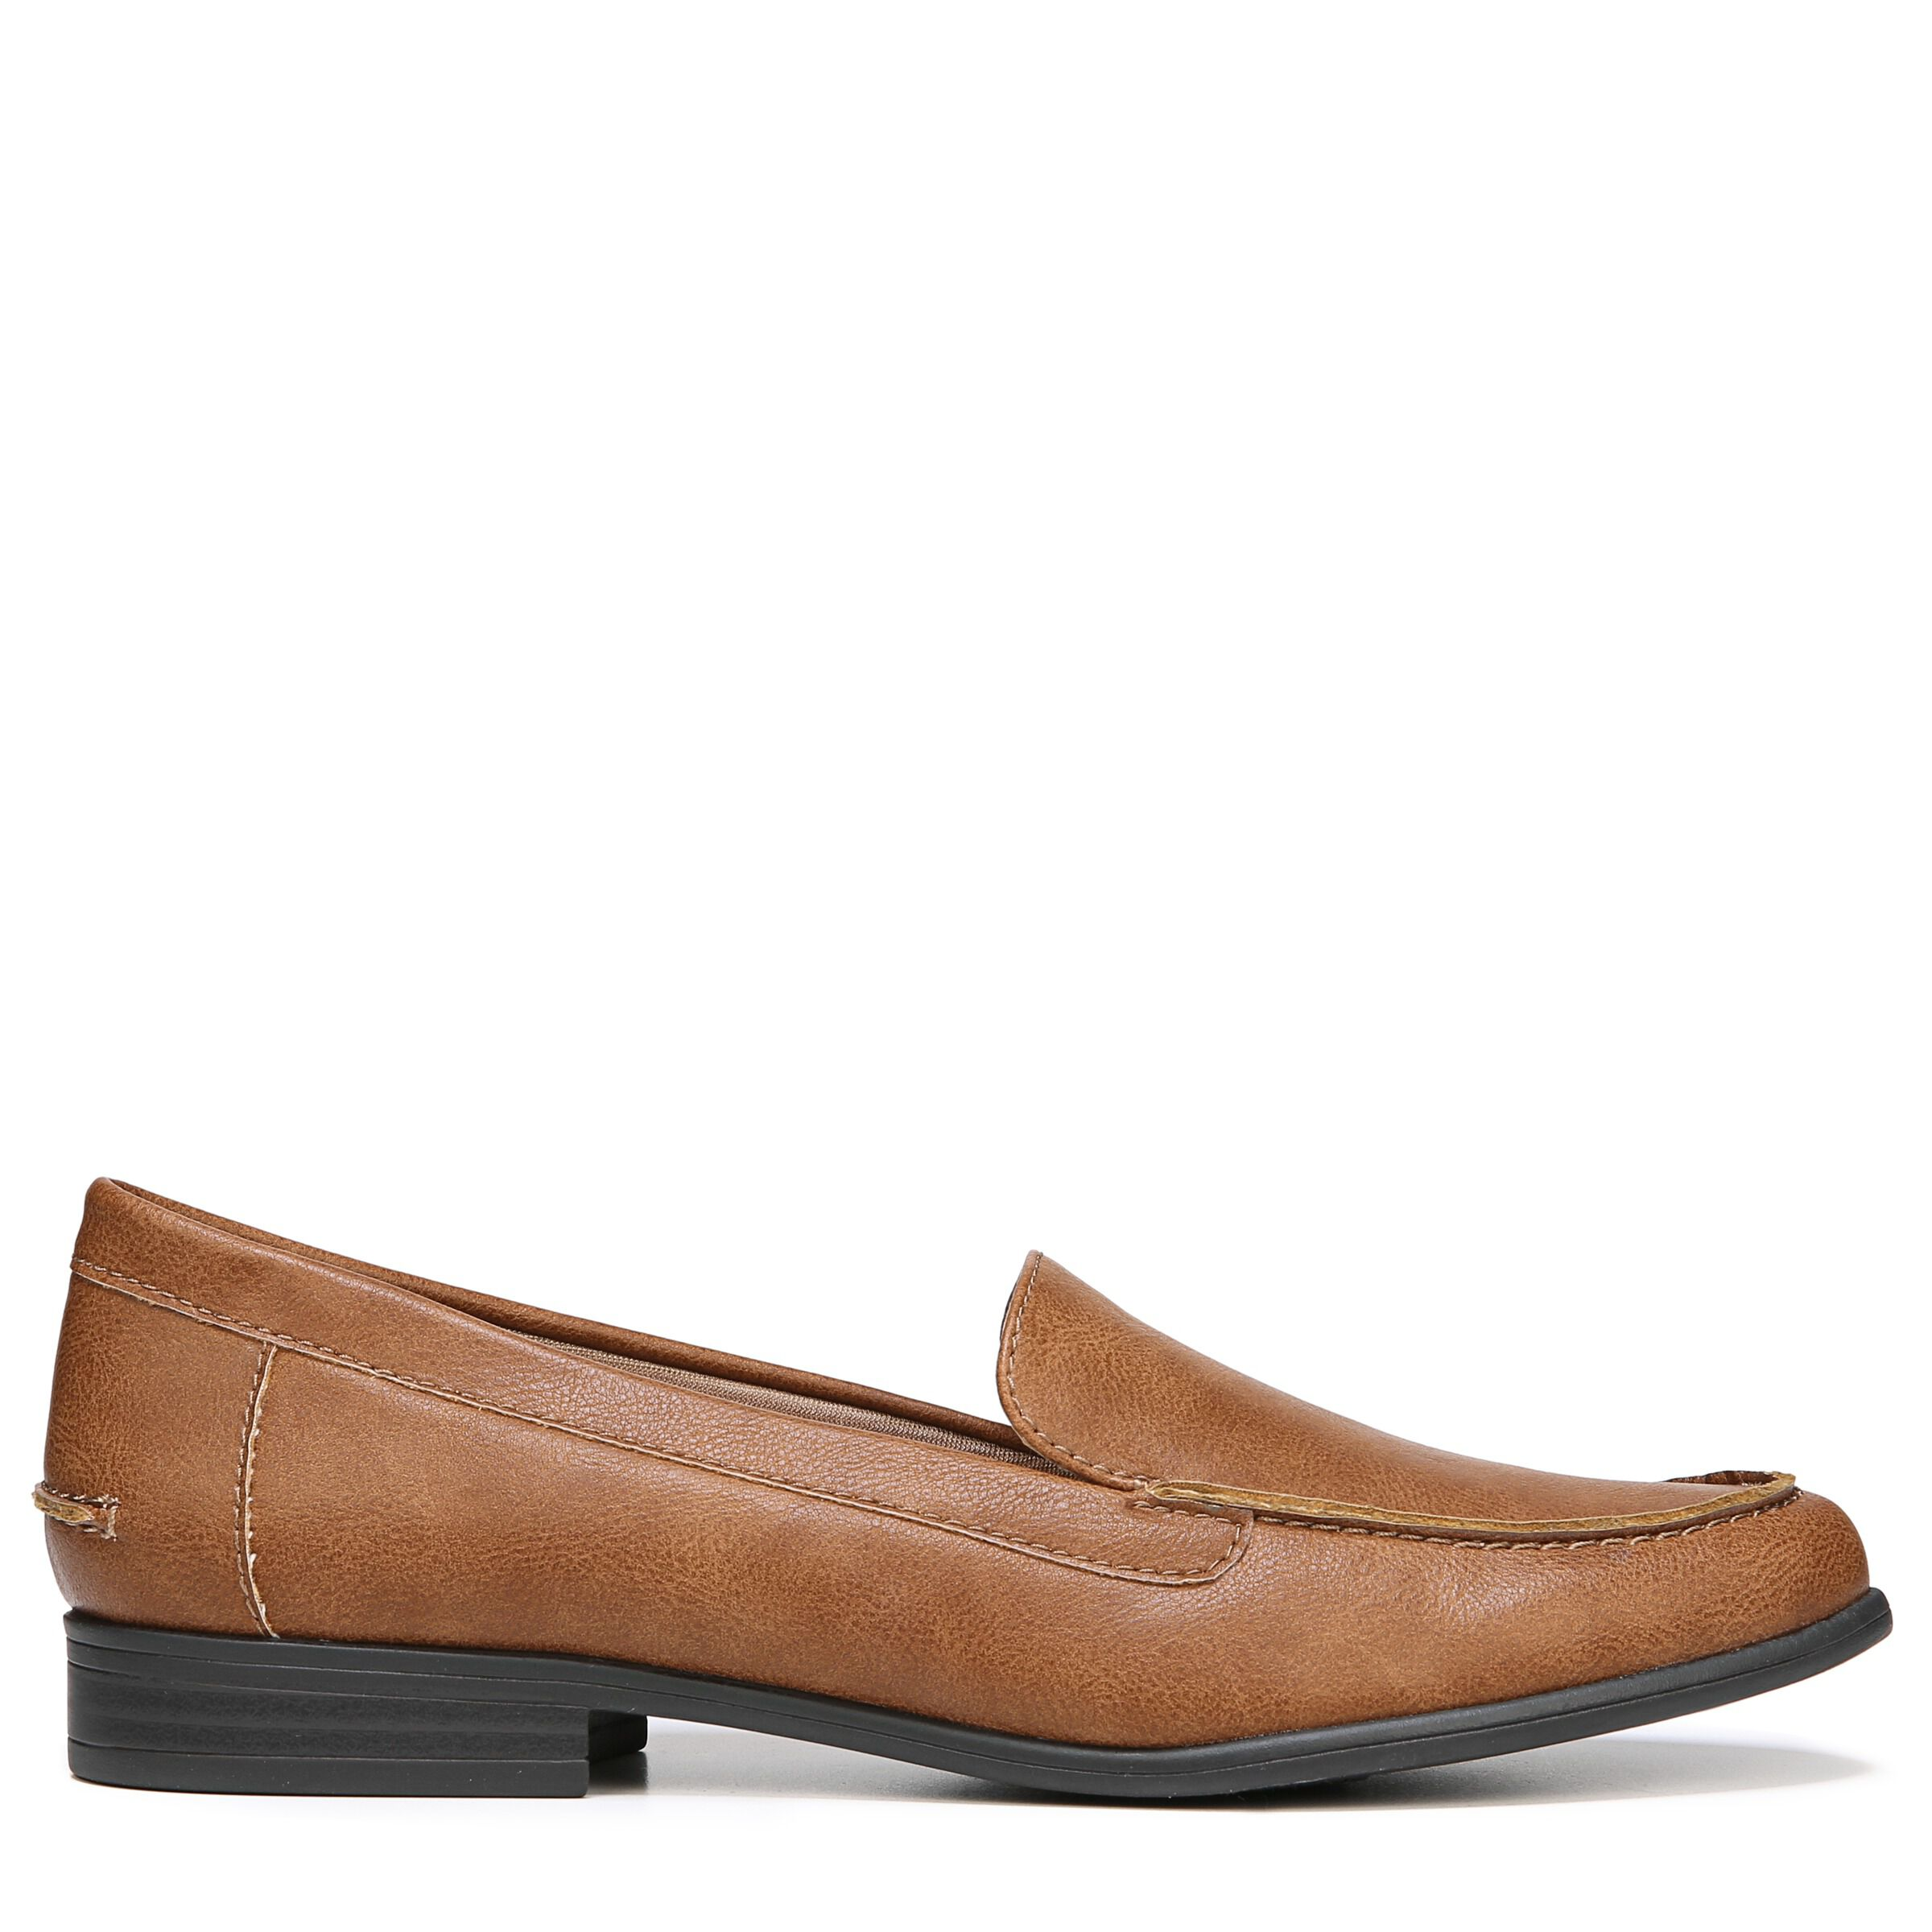 buy new series Women's LifeStride Margot Shoes Tan